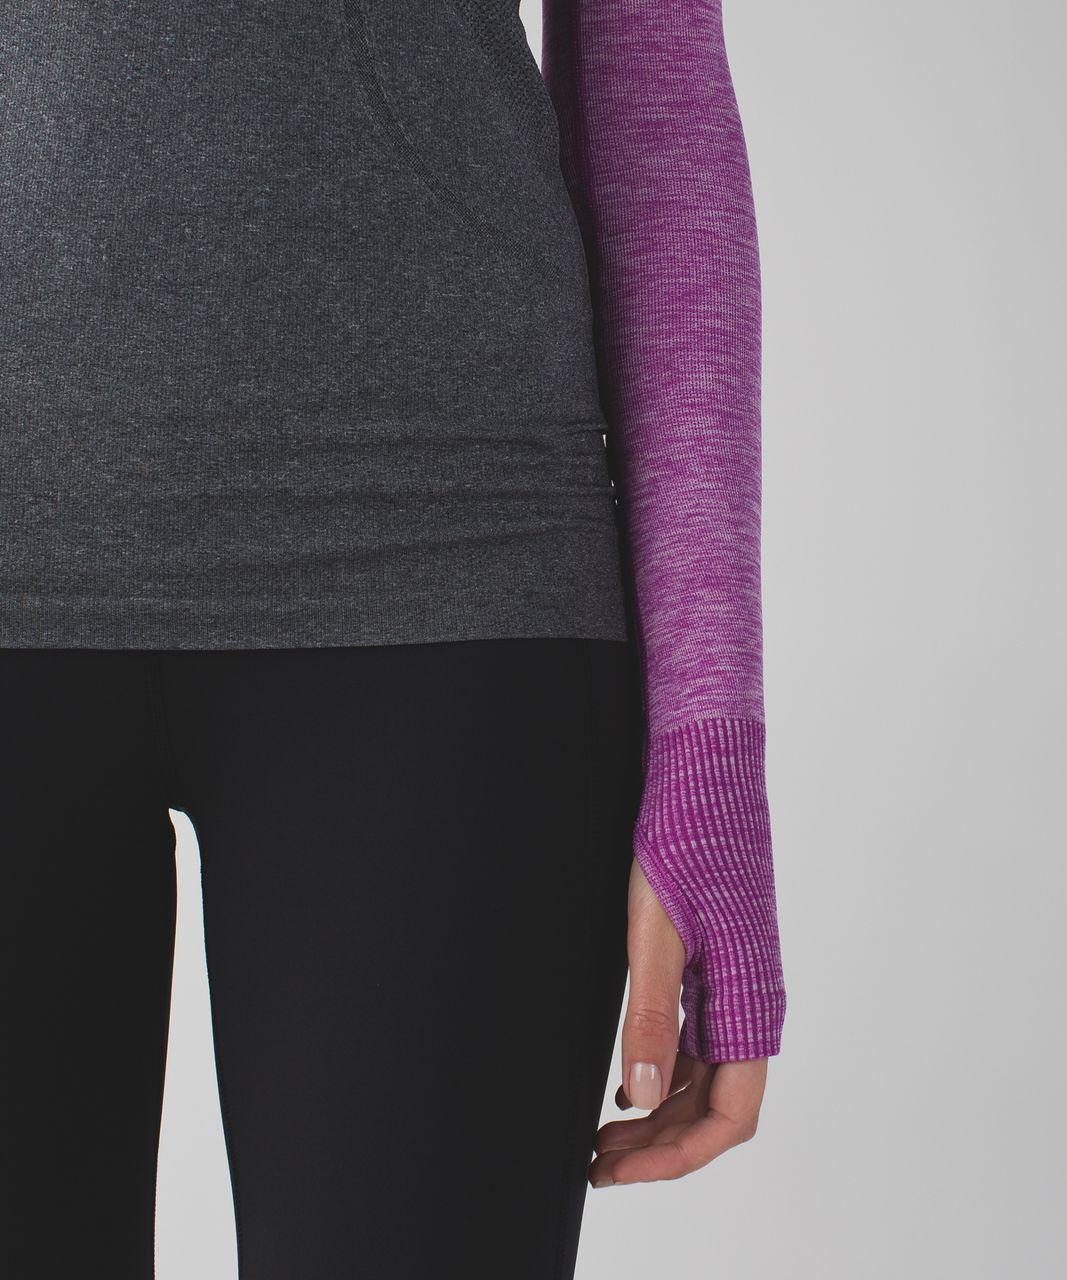 Lululemon Swiftly Arm Warmer (Reflective) - Heathered Ultra Violet